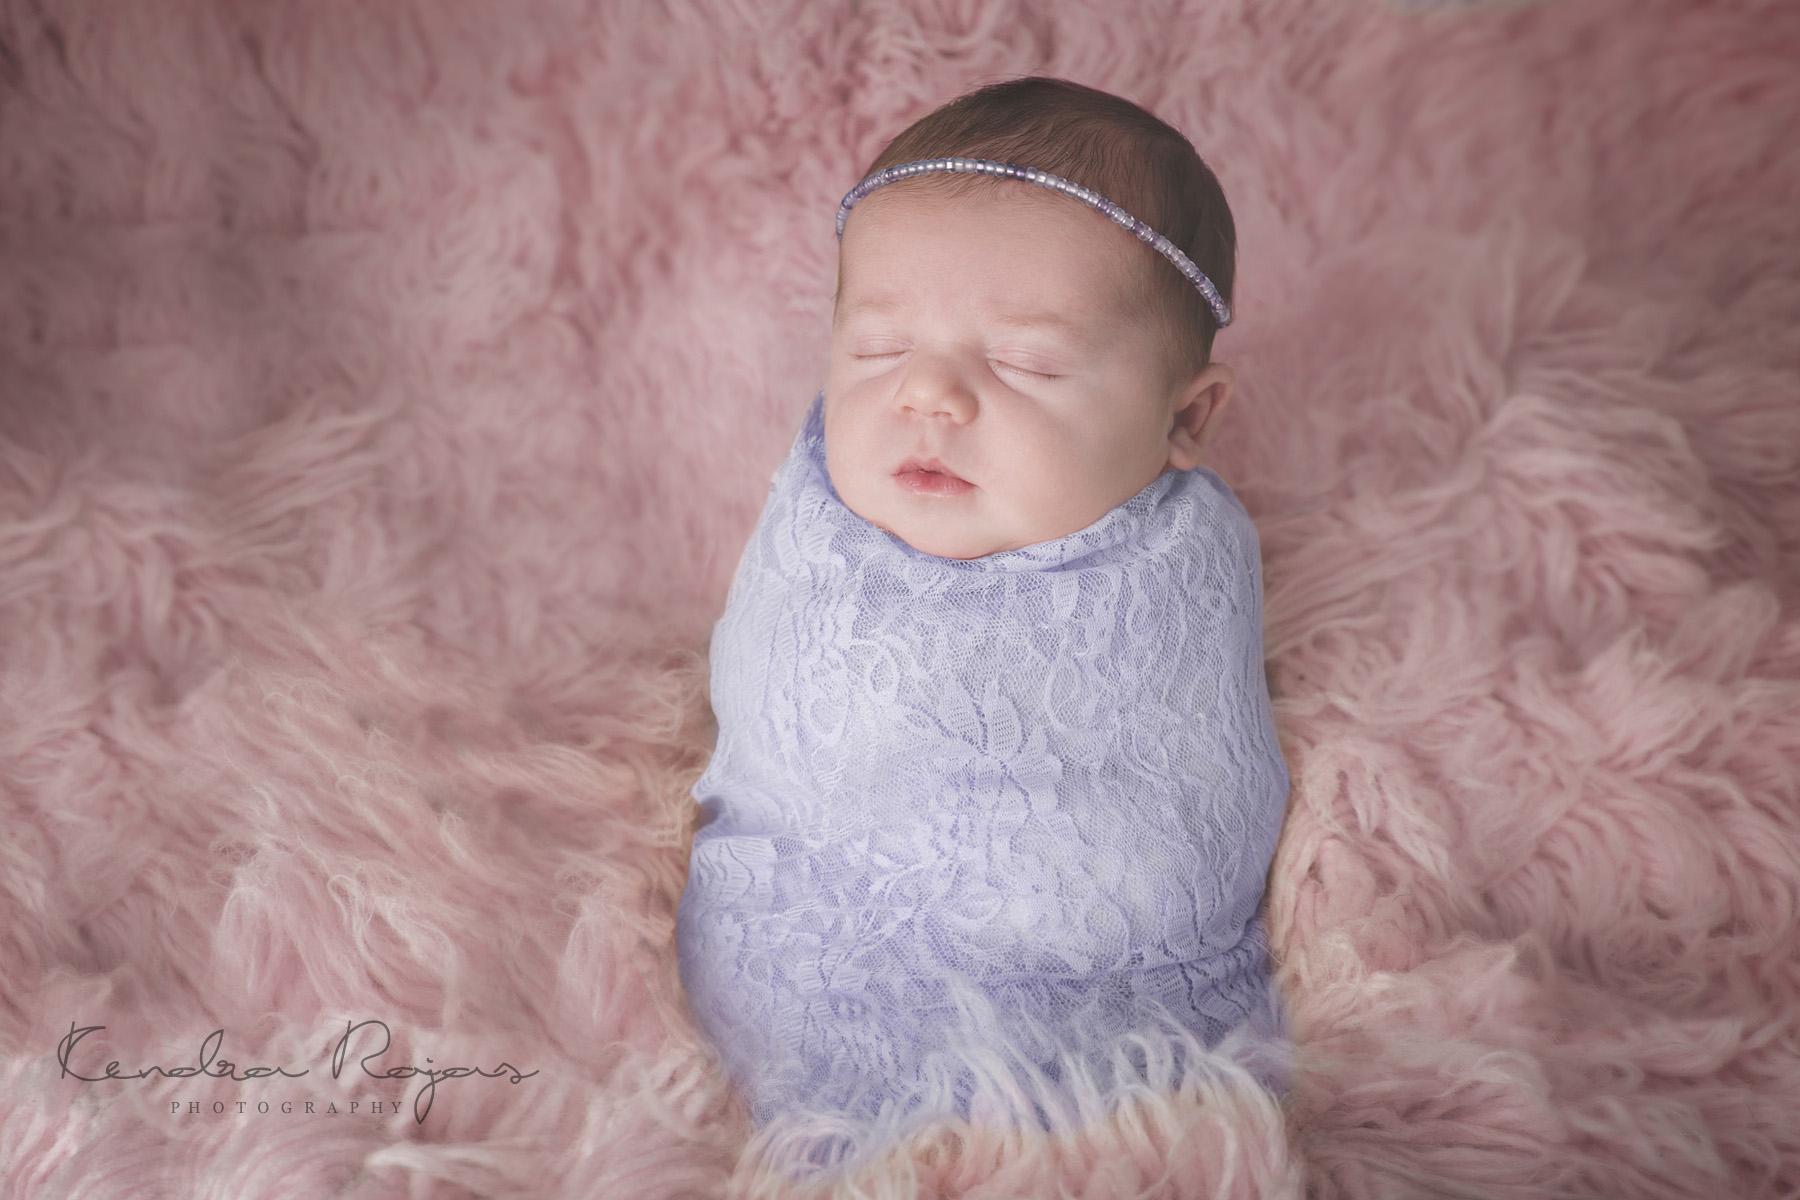 Newborn_Charlotte 112216_06_LOW_Social.jpg